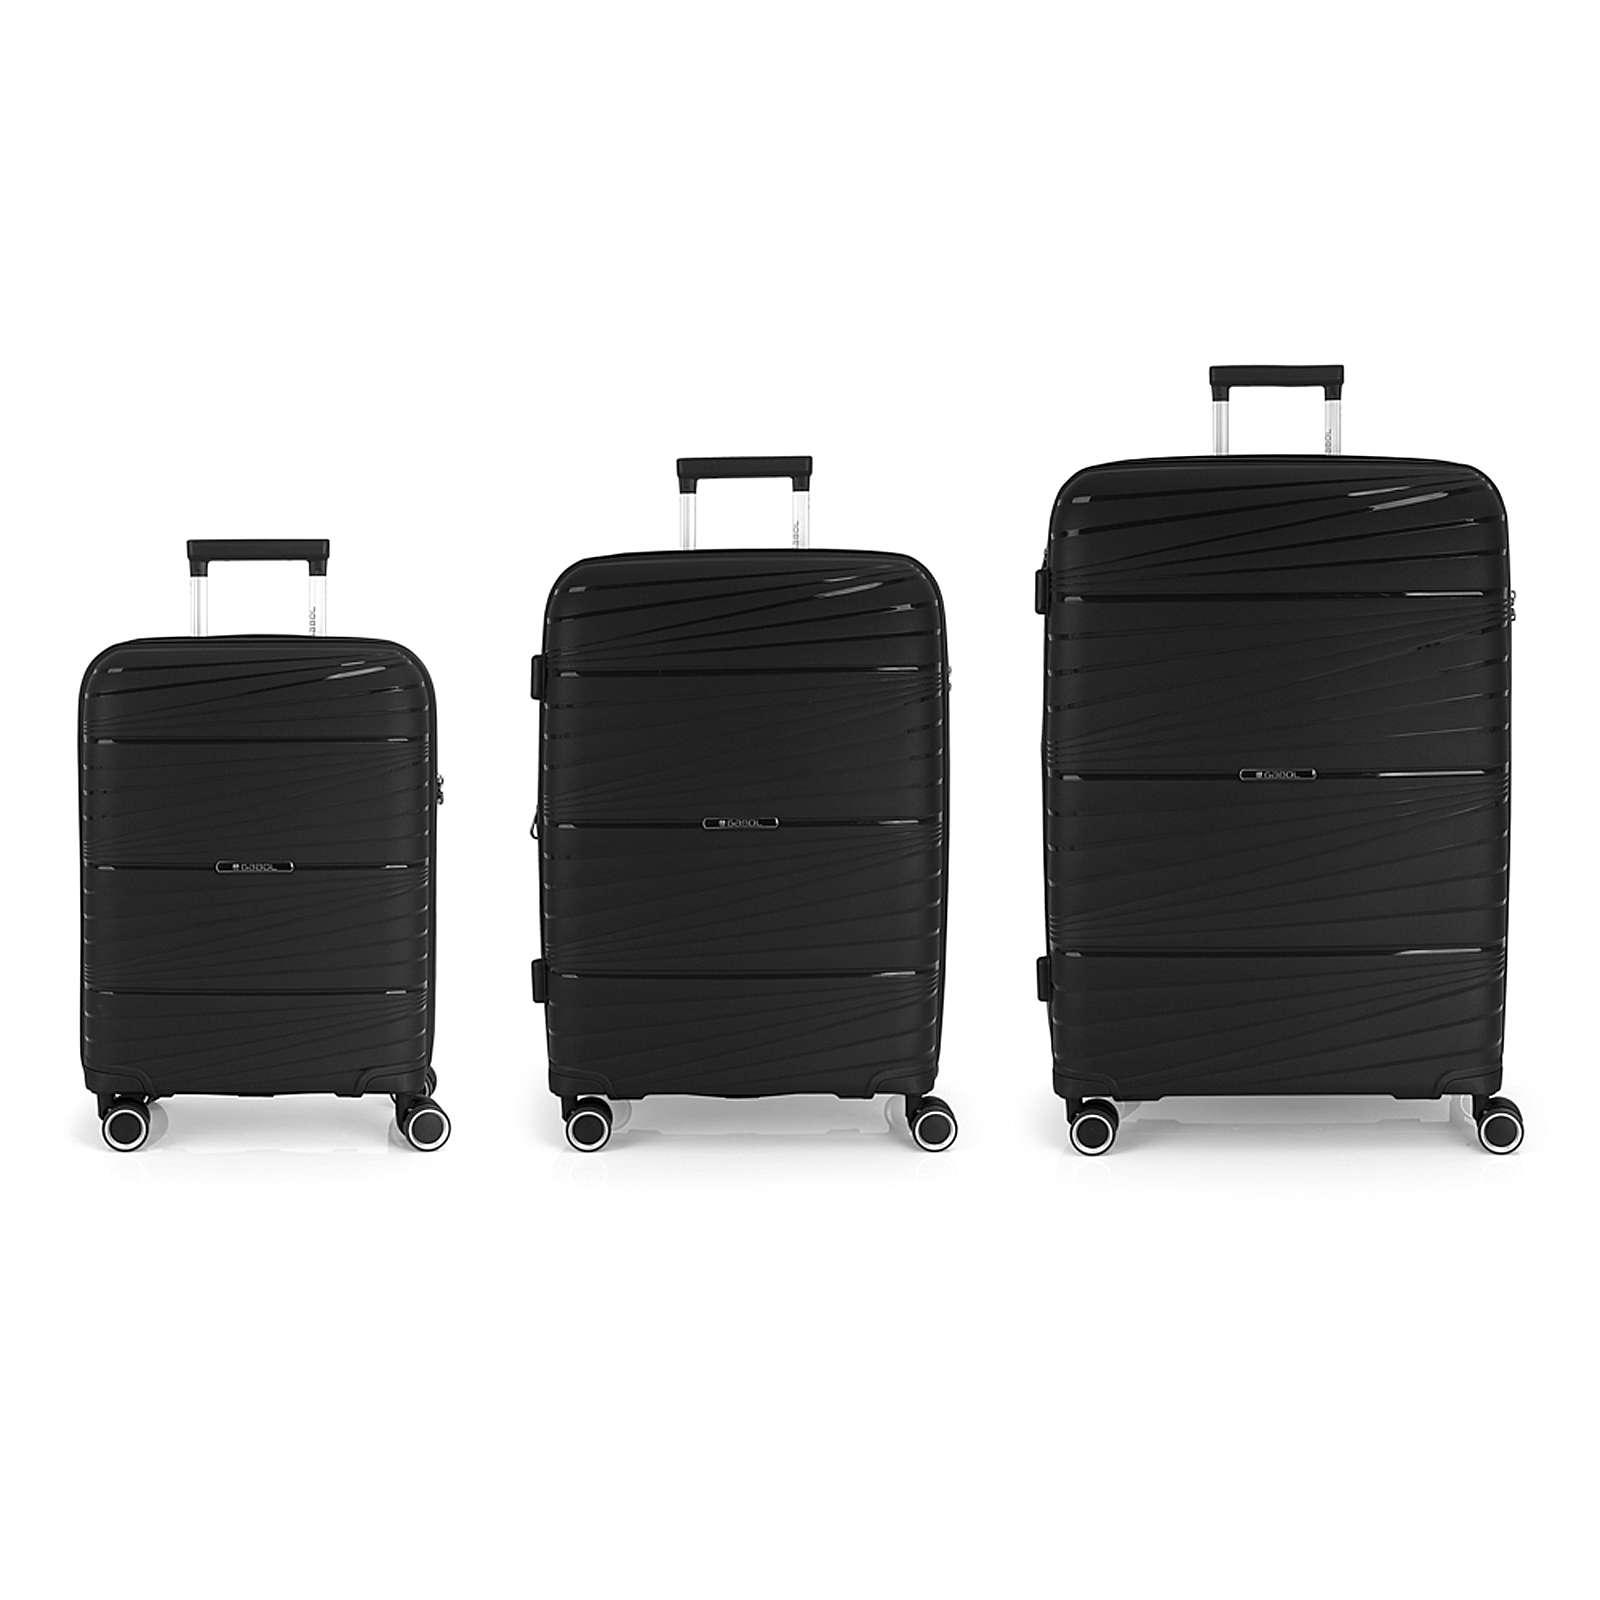 Gabol Kiba 4-Rollen Kofferset 3tlg. Trolleys schwarz